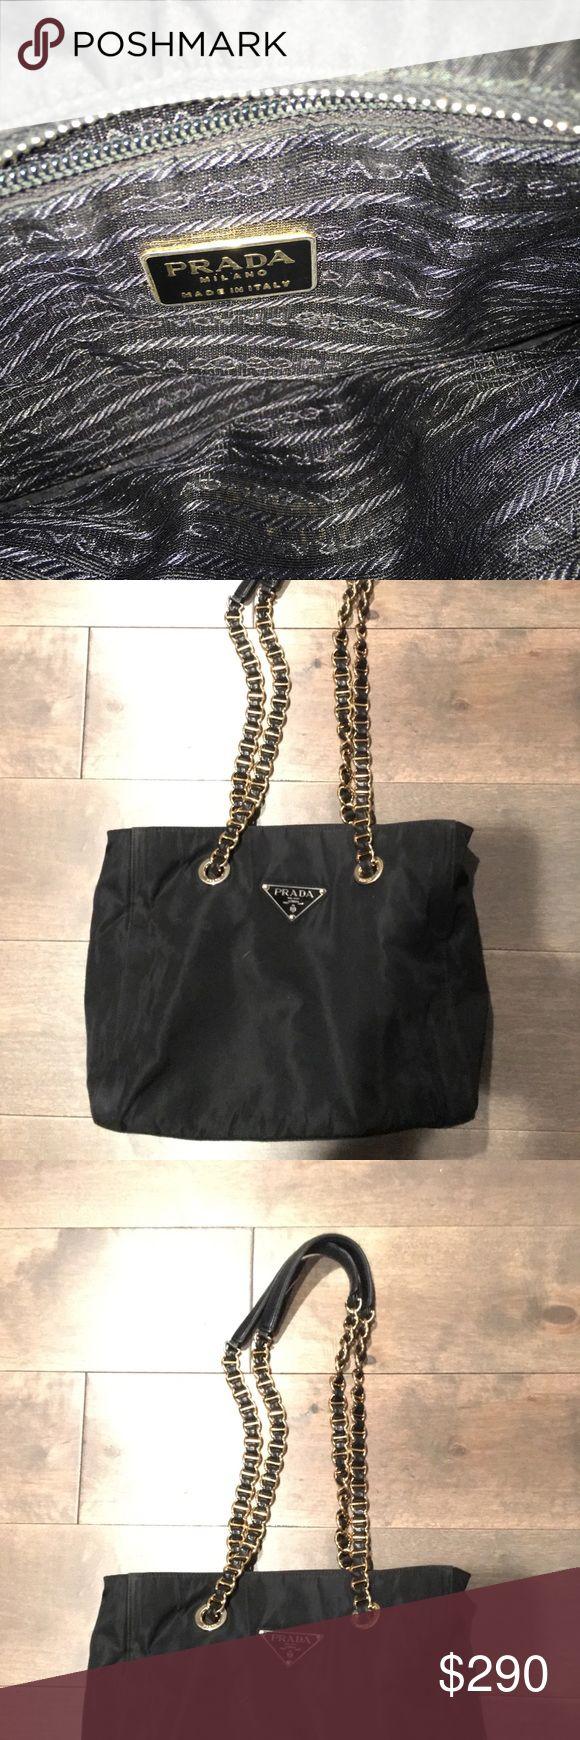 Prada Tessuto Shoulder Bag Authentic Shoulder bag with gold-tone hardware, chain link and leather strap Prada Bags Shoulder Bags